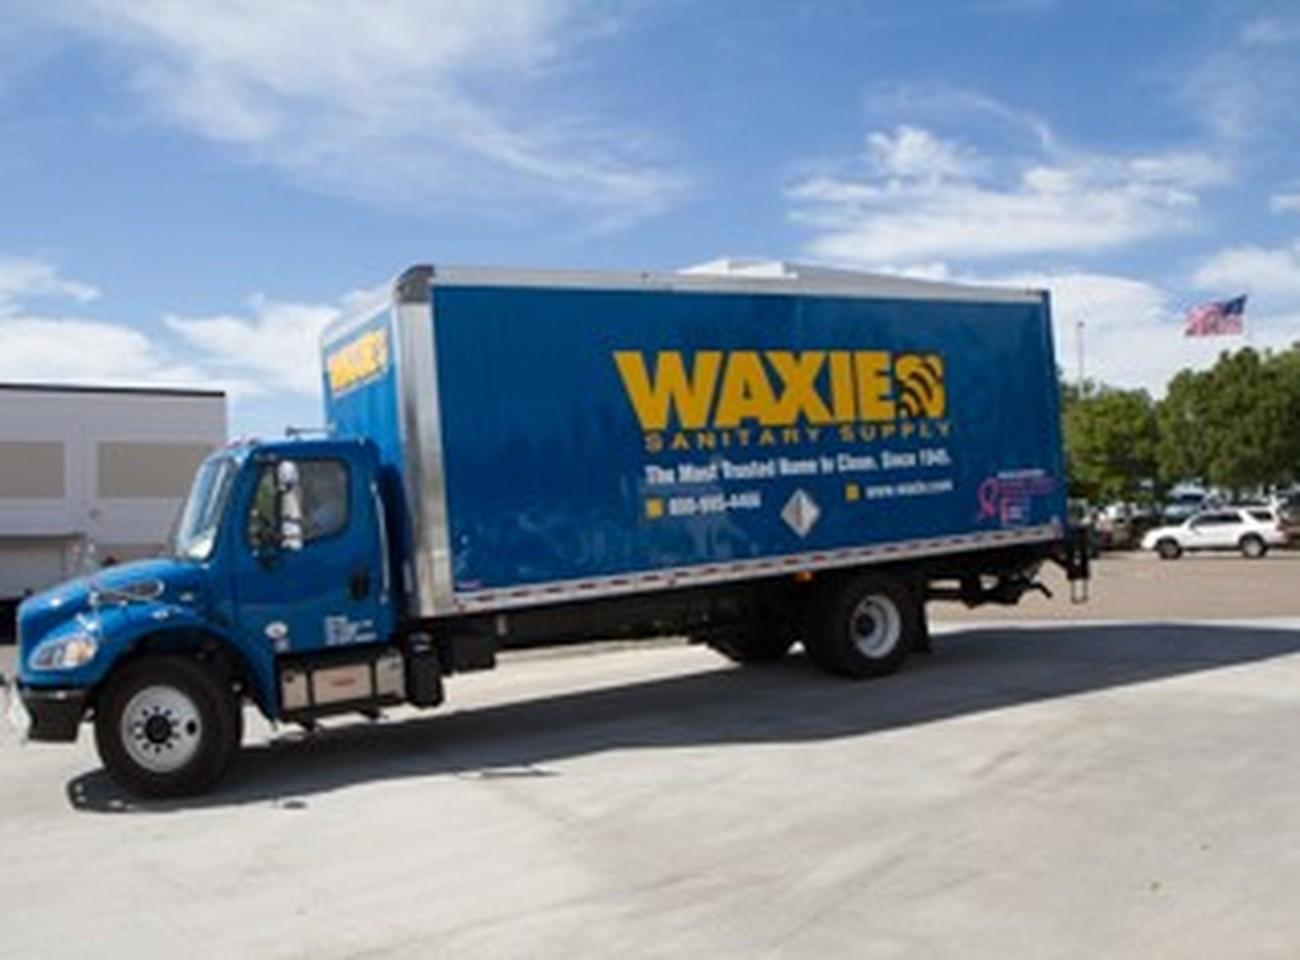 WAXIE Sanitary Supply Careers